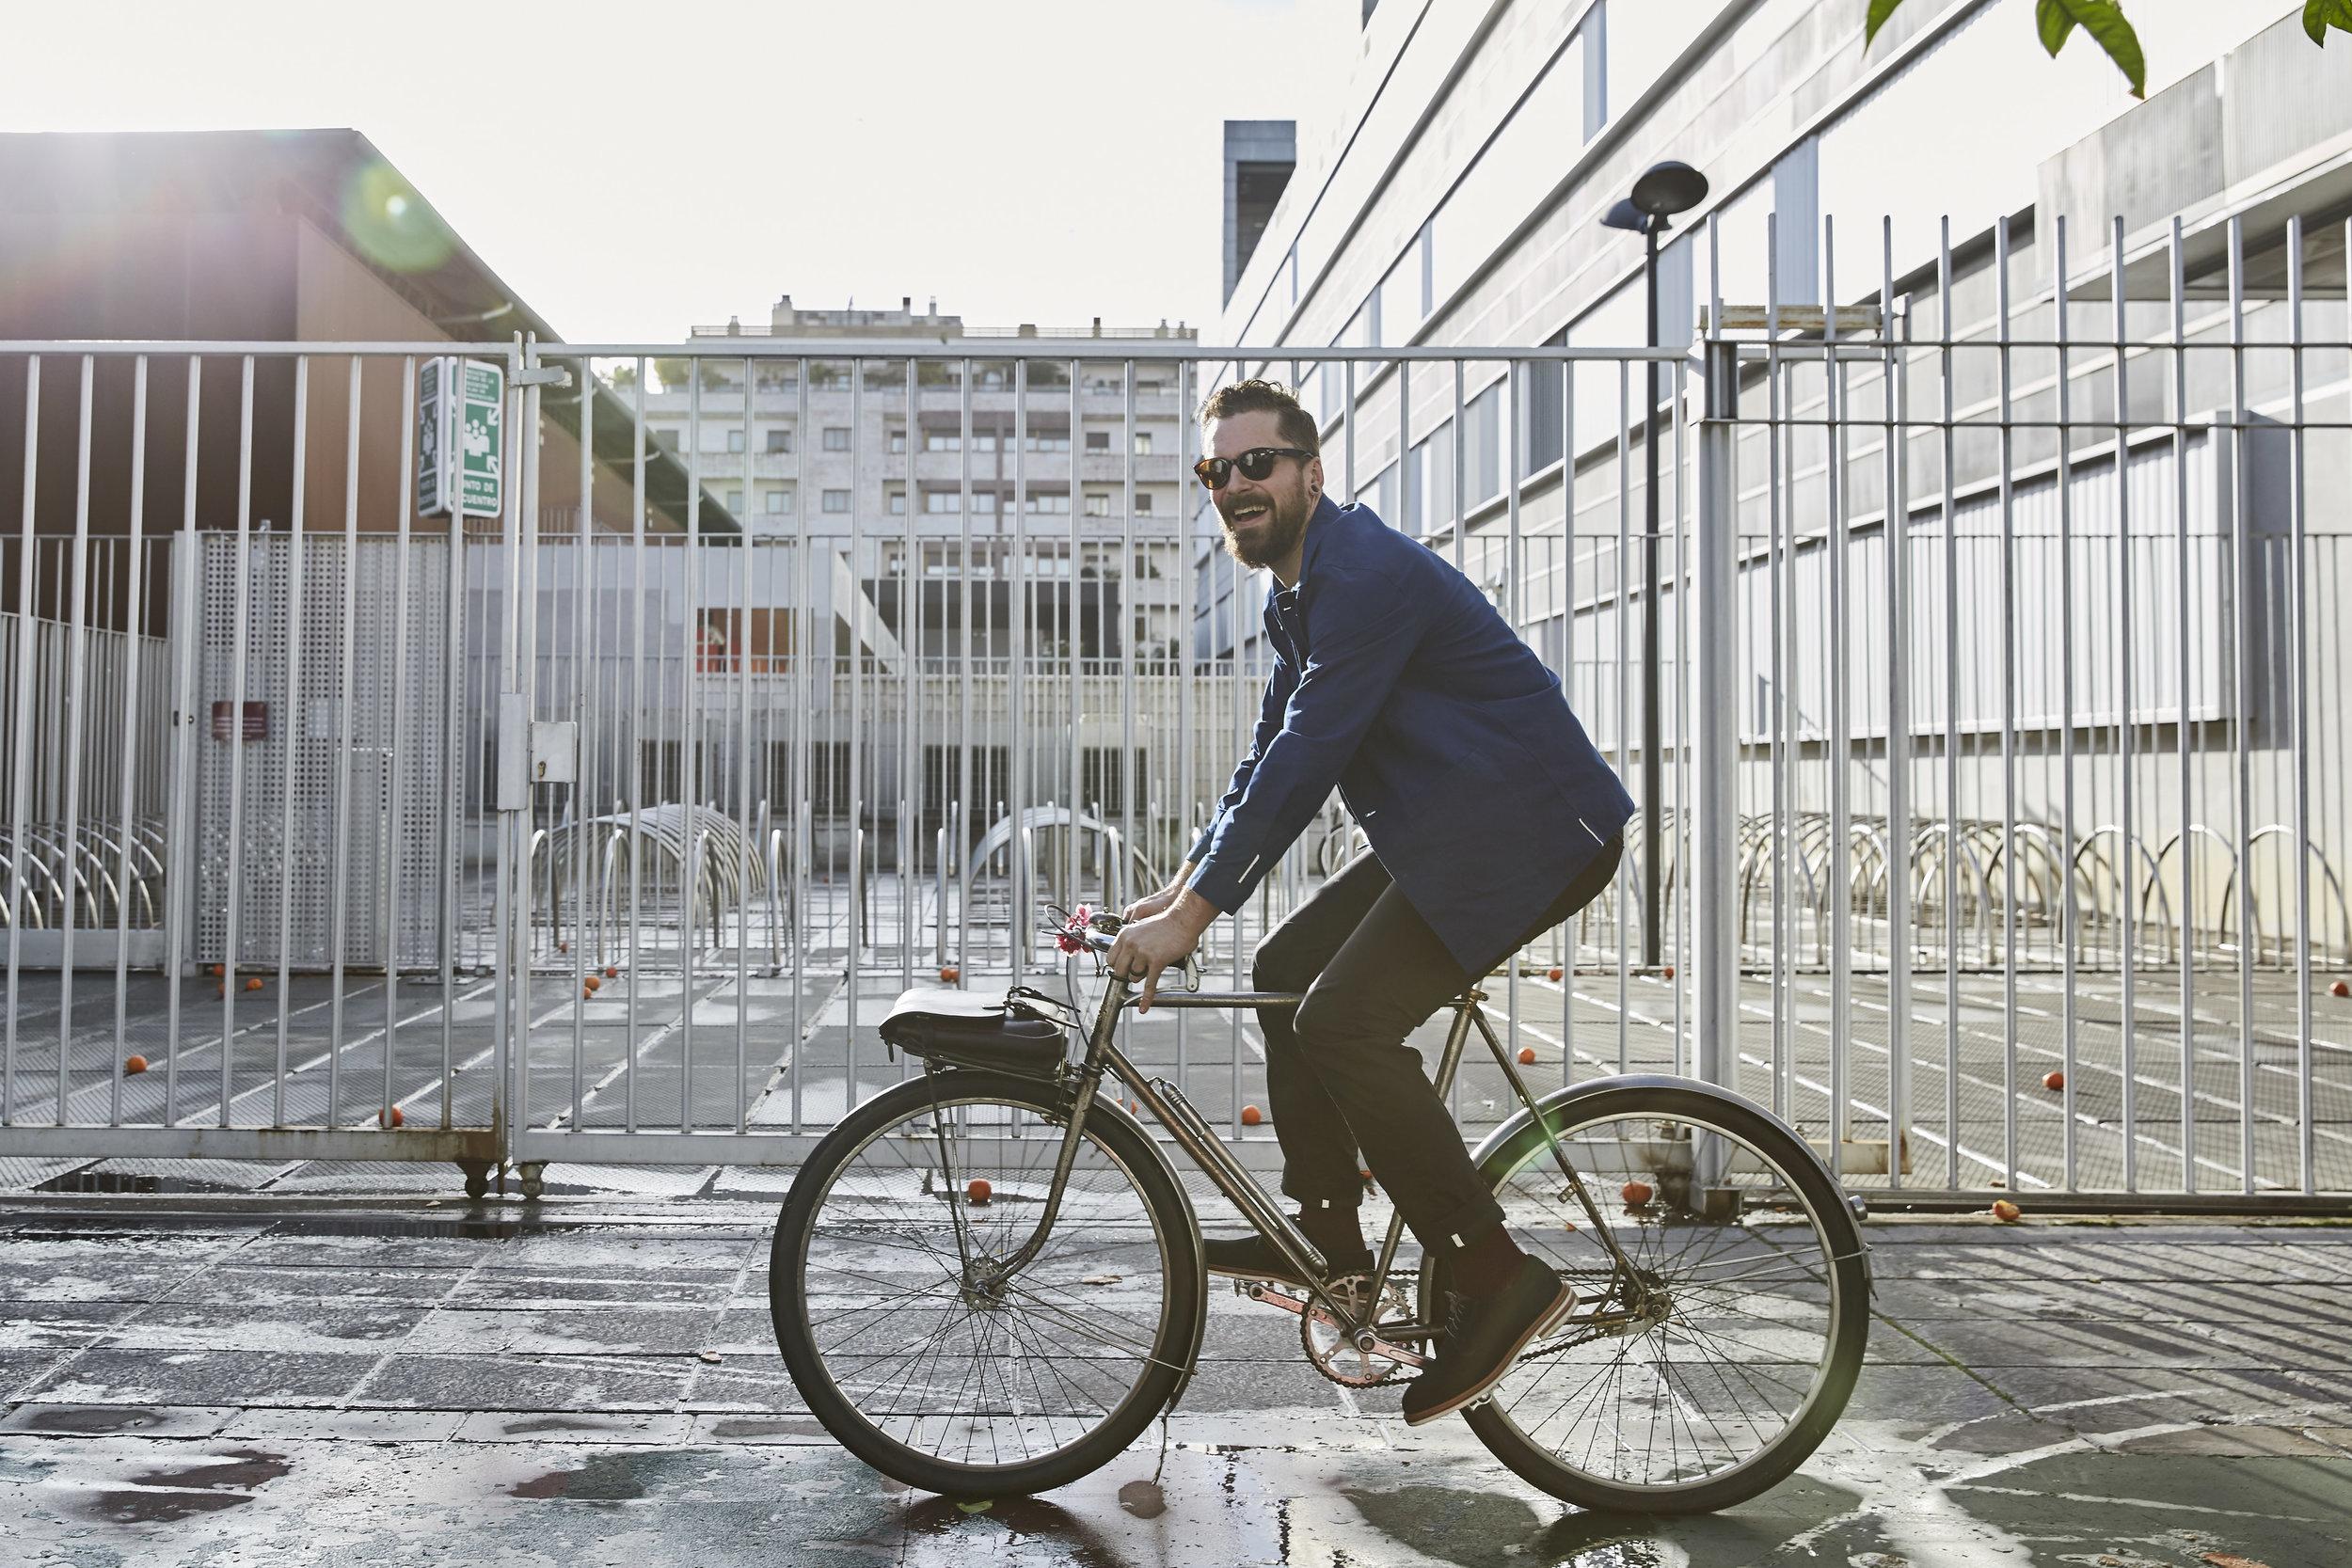 vulpine nick hussey urban cycling style laughing sun smile.jpg